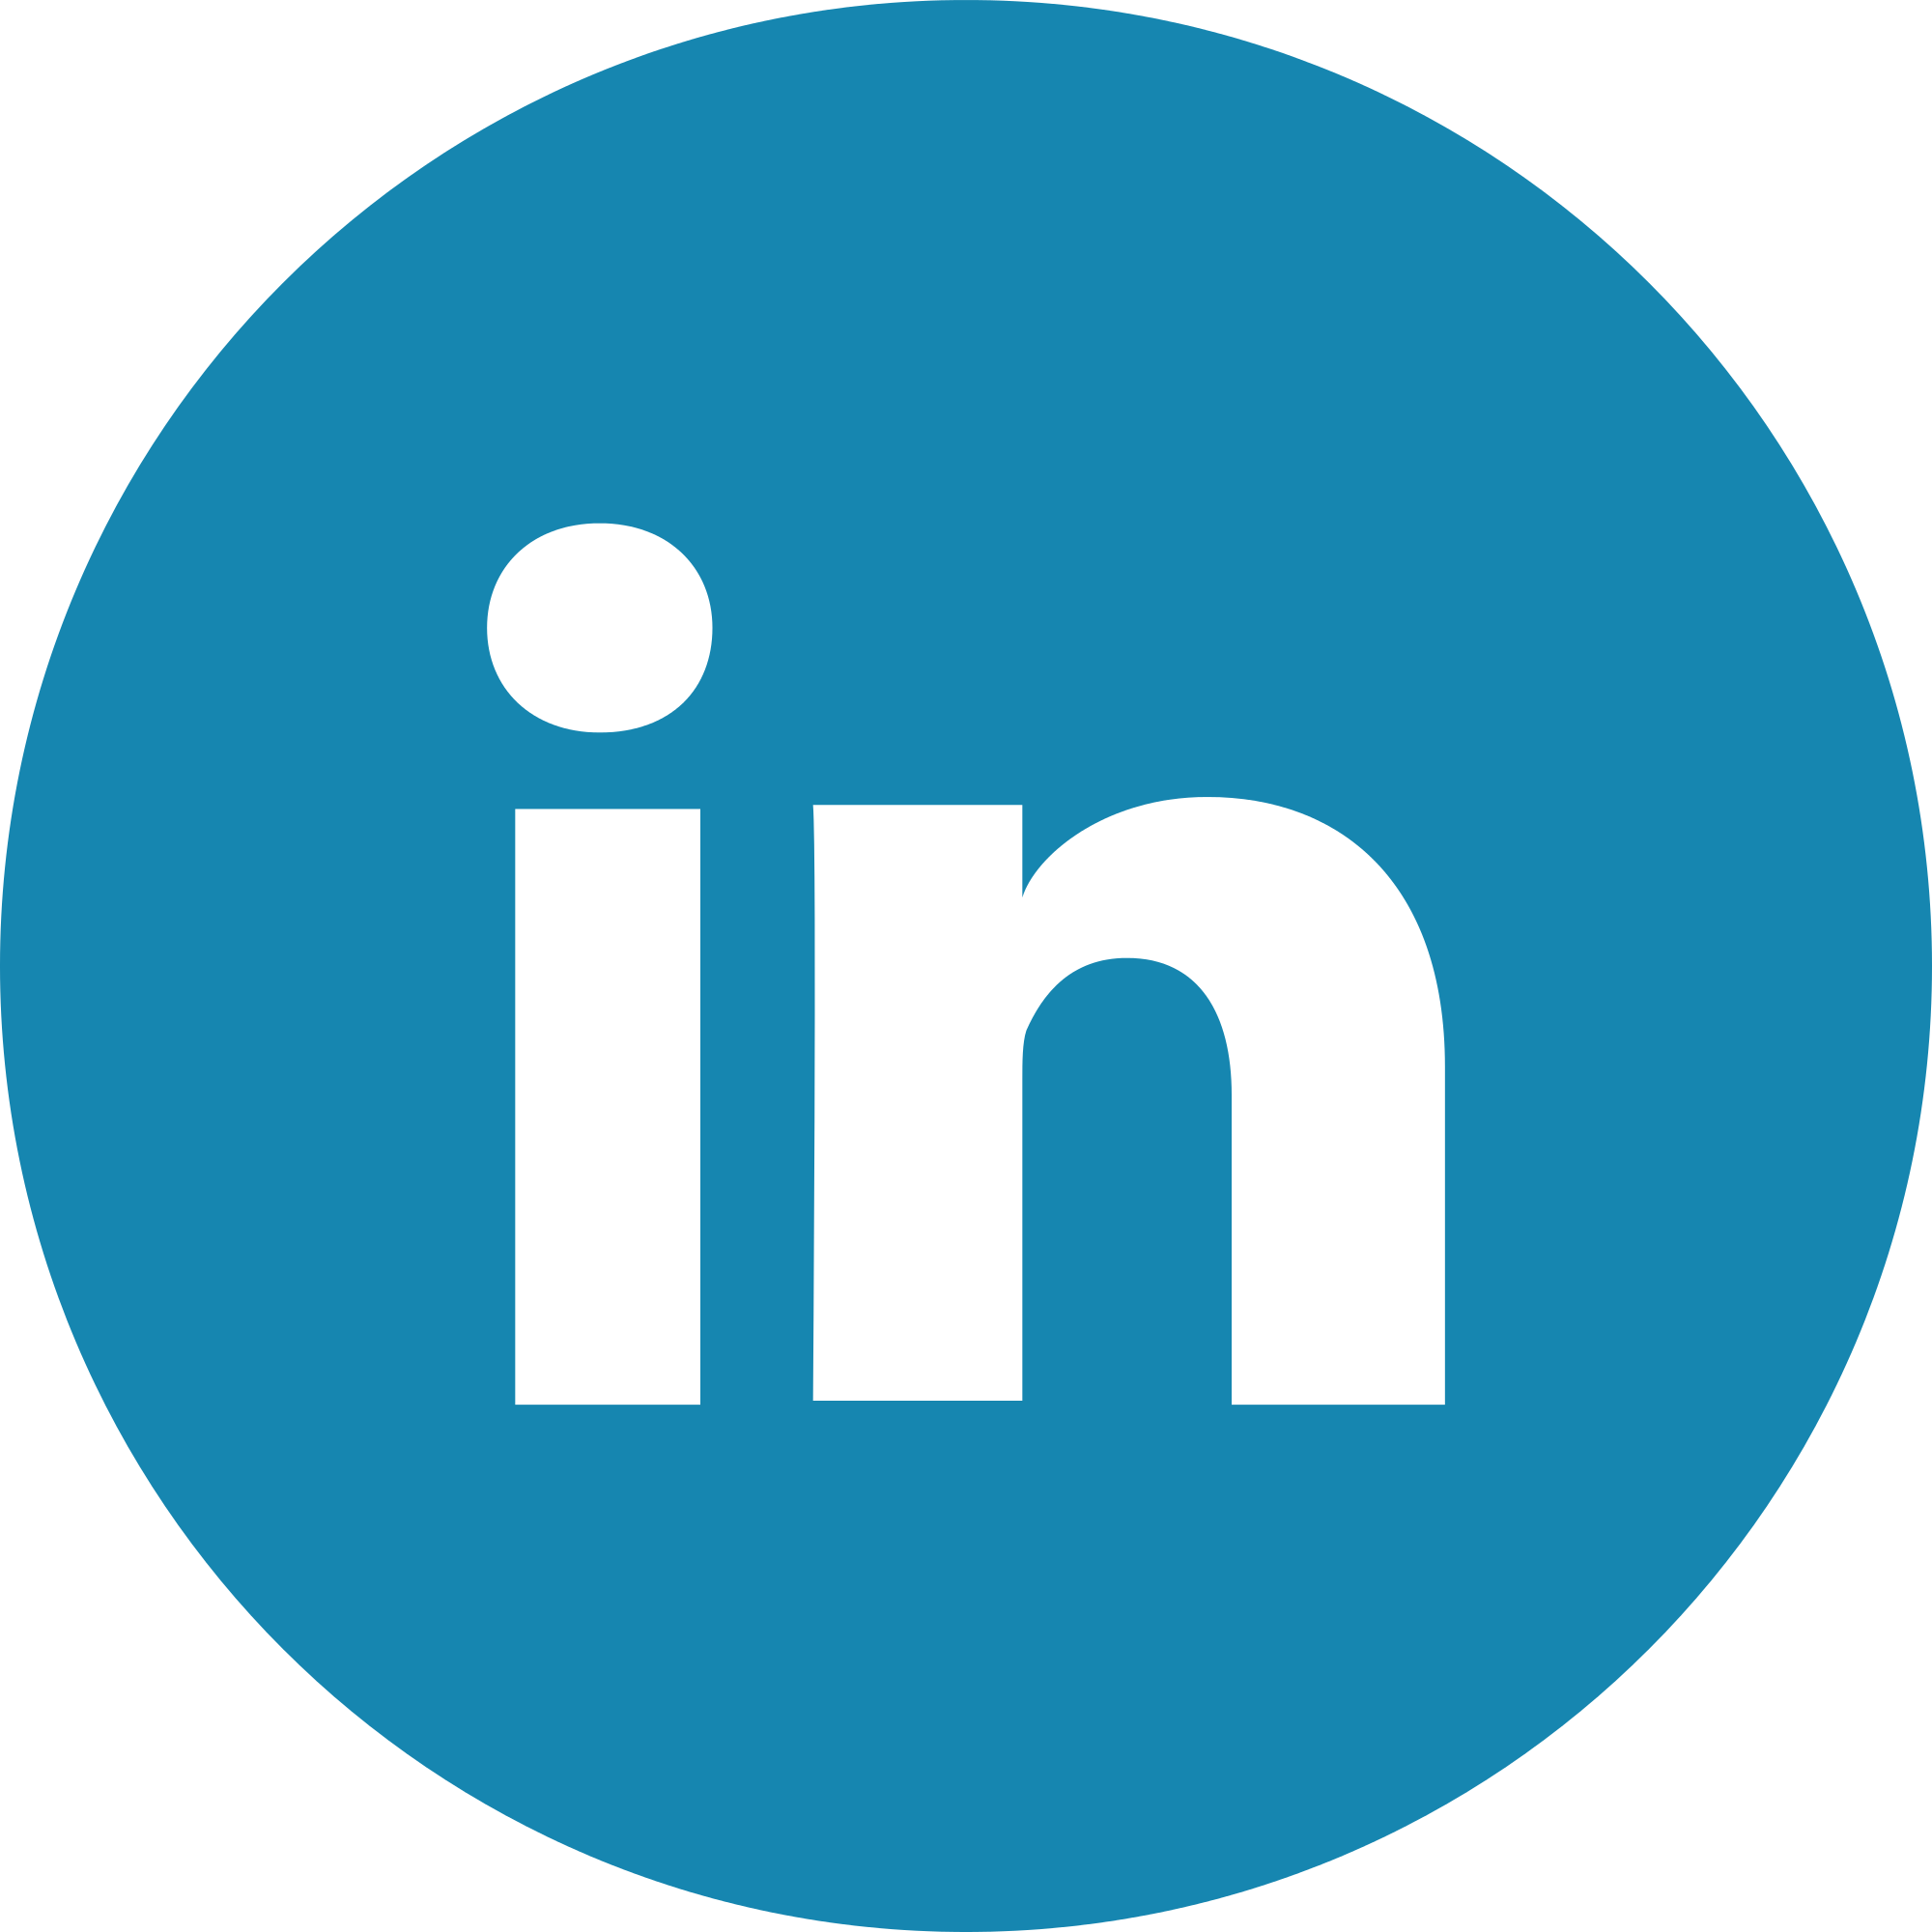 Makelaar Tsjechie op Linkedin